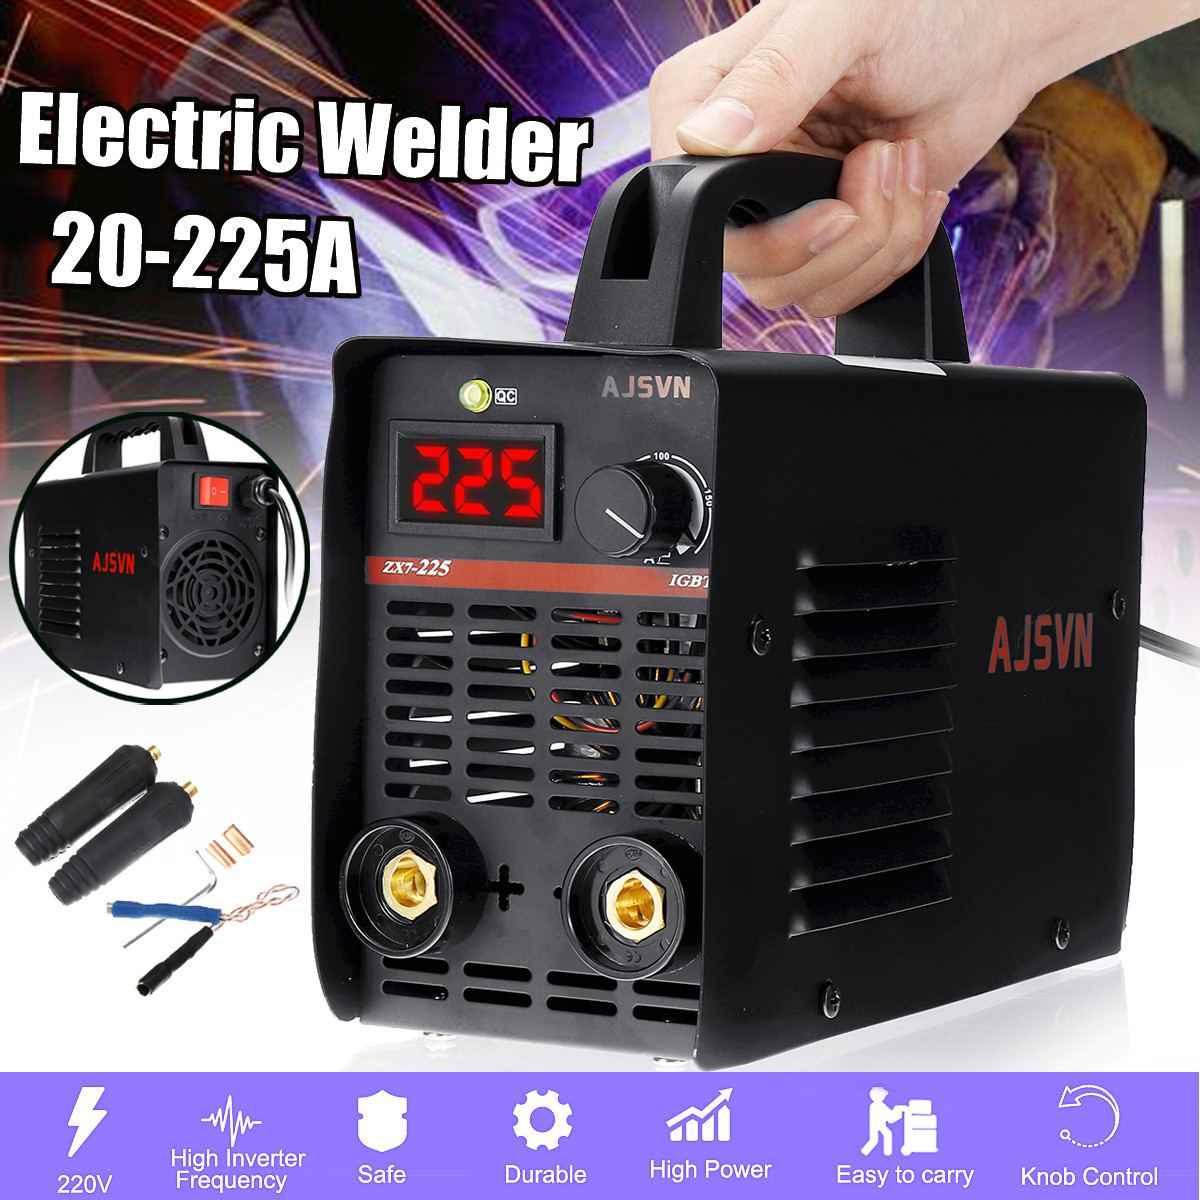 220 V 4200 W 20-225A Mini MMA de inversor IGBT soldadura de arco eléctrico soldador máquina-herramienta